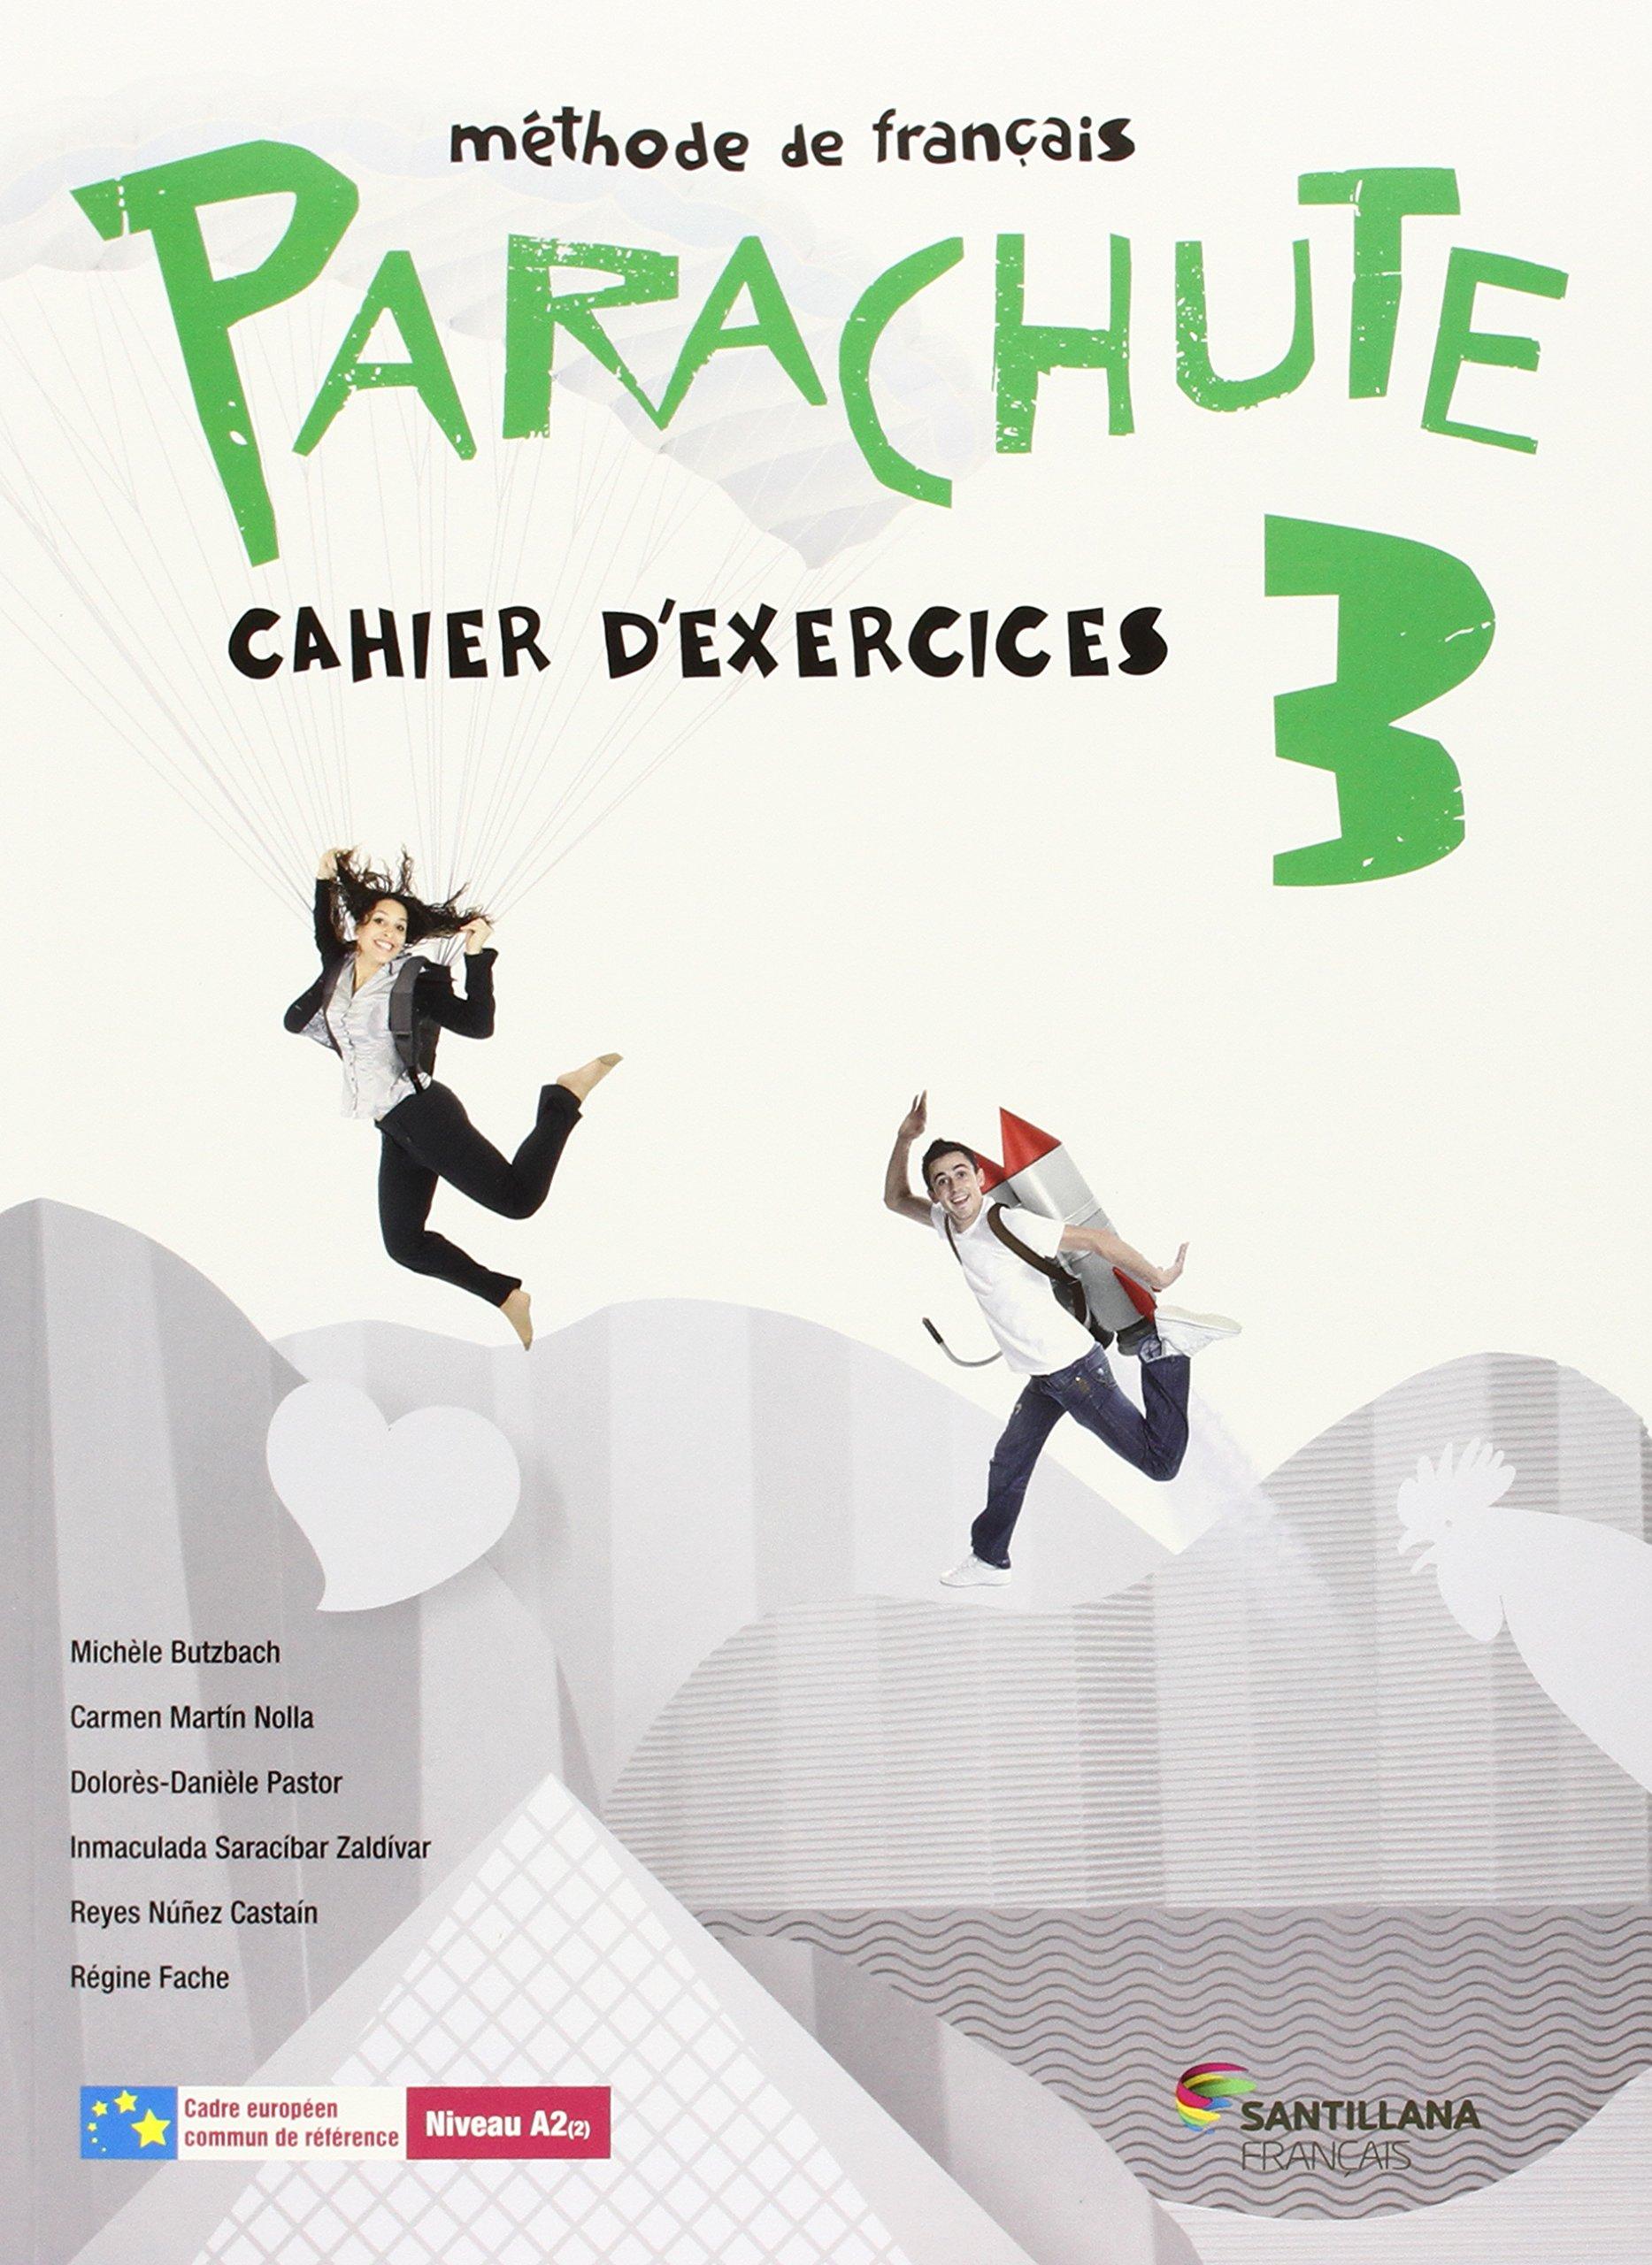 PARACHUTE 3 PACK CAHIER D'EXERCICES - 9788490490174 Tapa blanda – 20 jul 2015 Aa.Vv. Santillana Français 8490490171 Lengua extranjera: francés